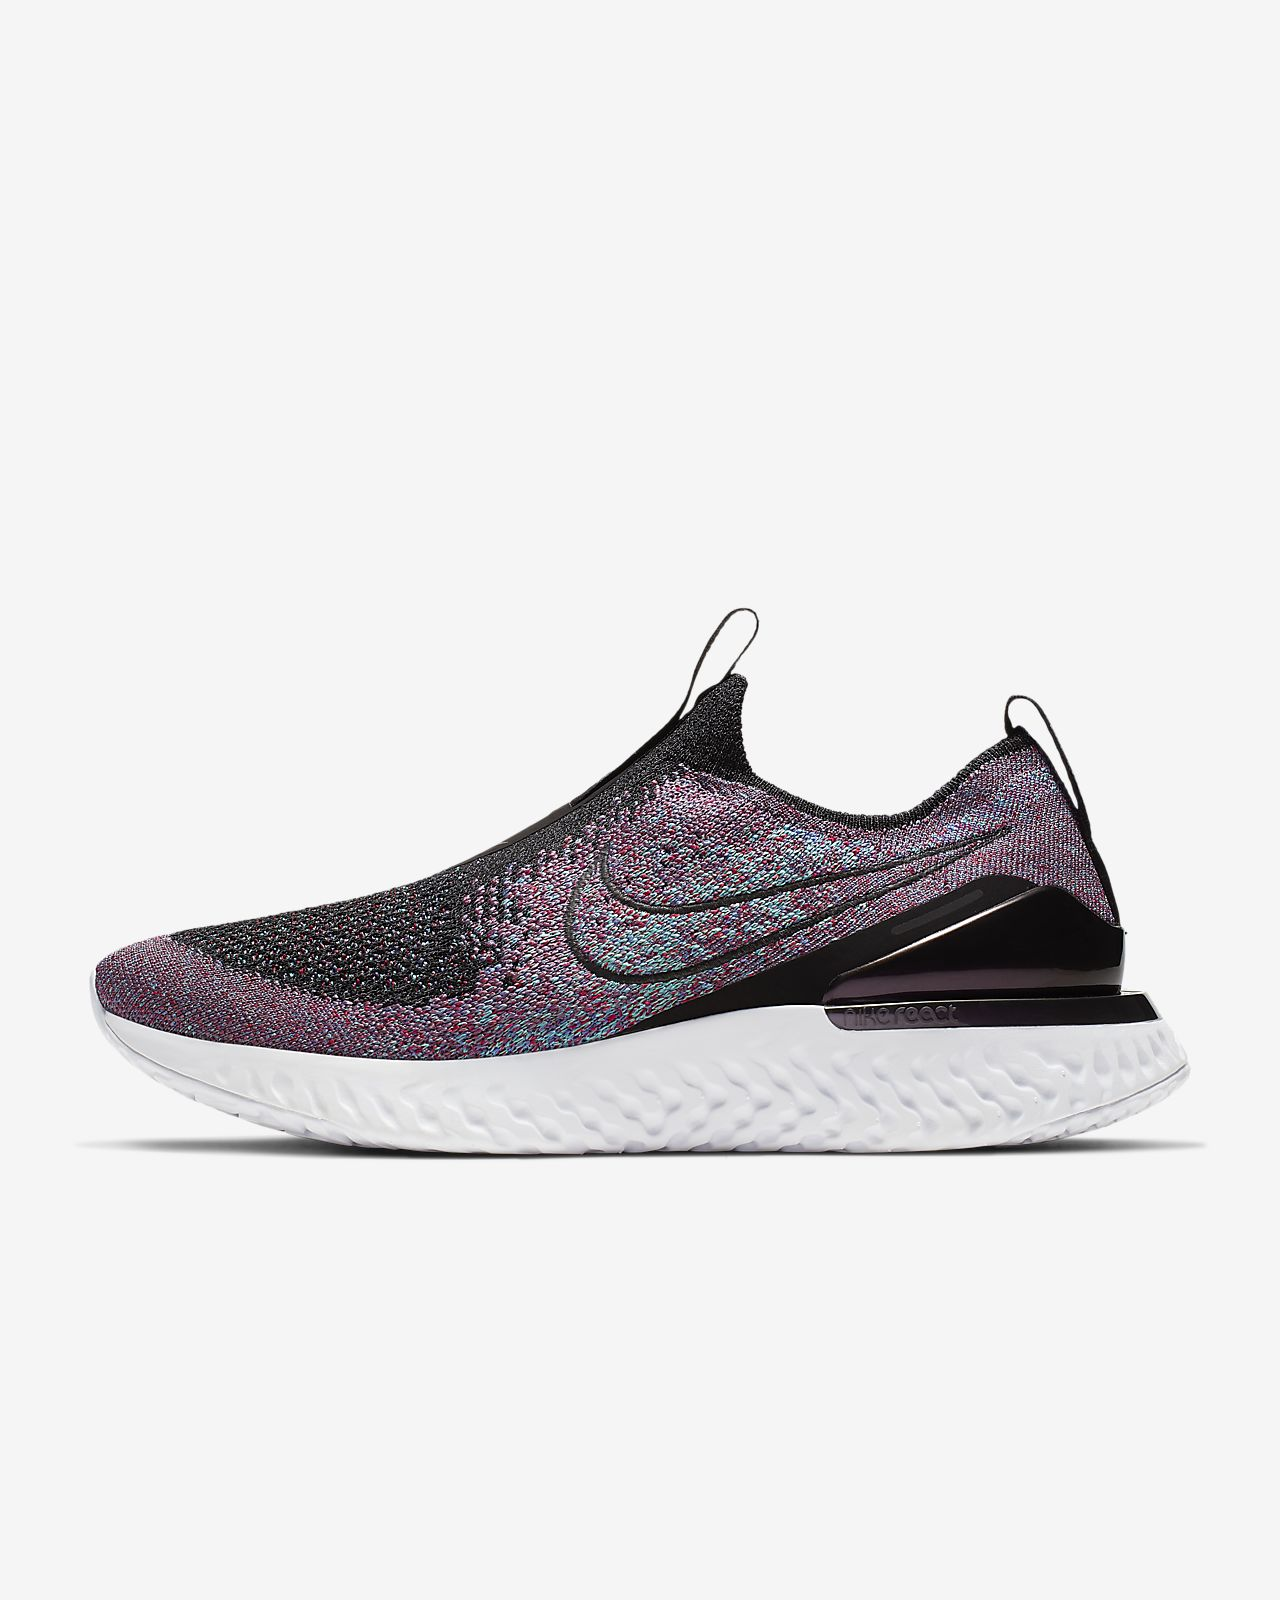 Calzado de running para mujer Nike Epic Phantom React Flyknit